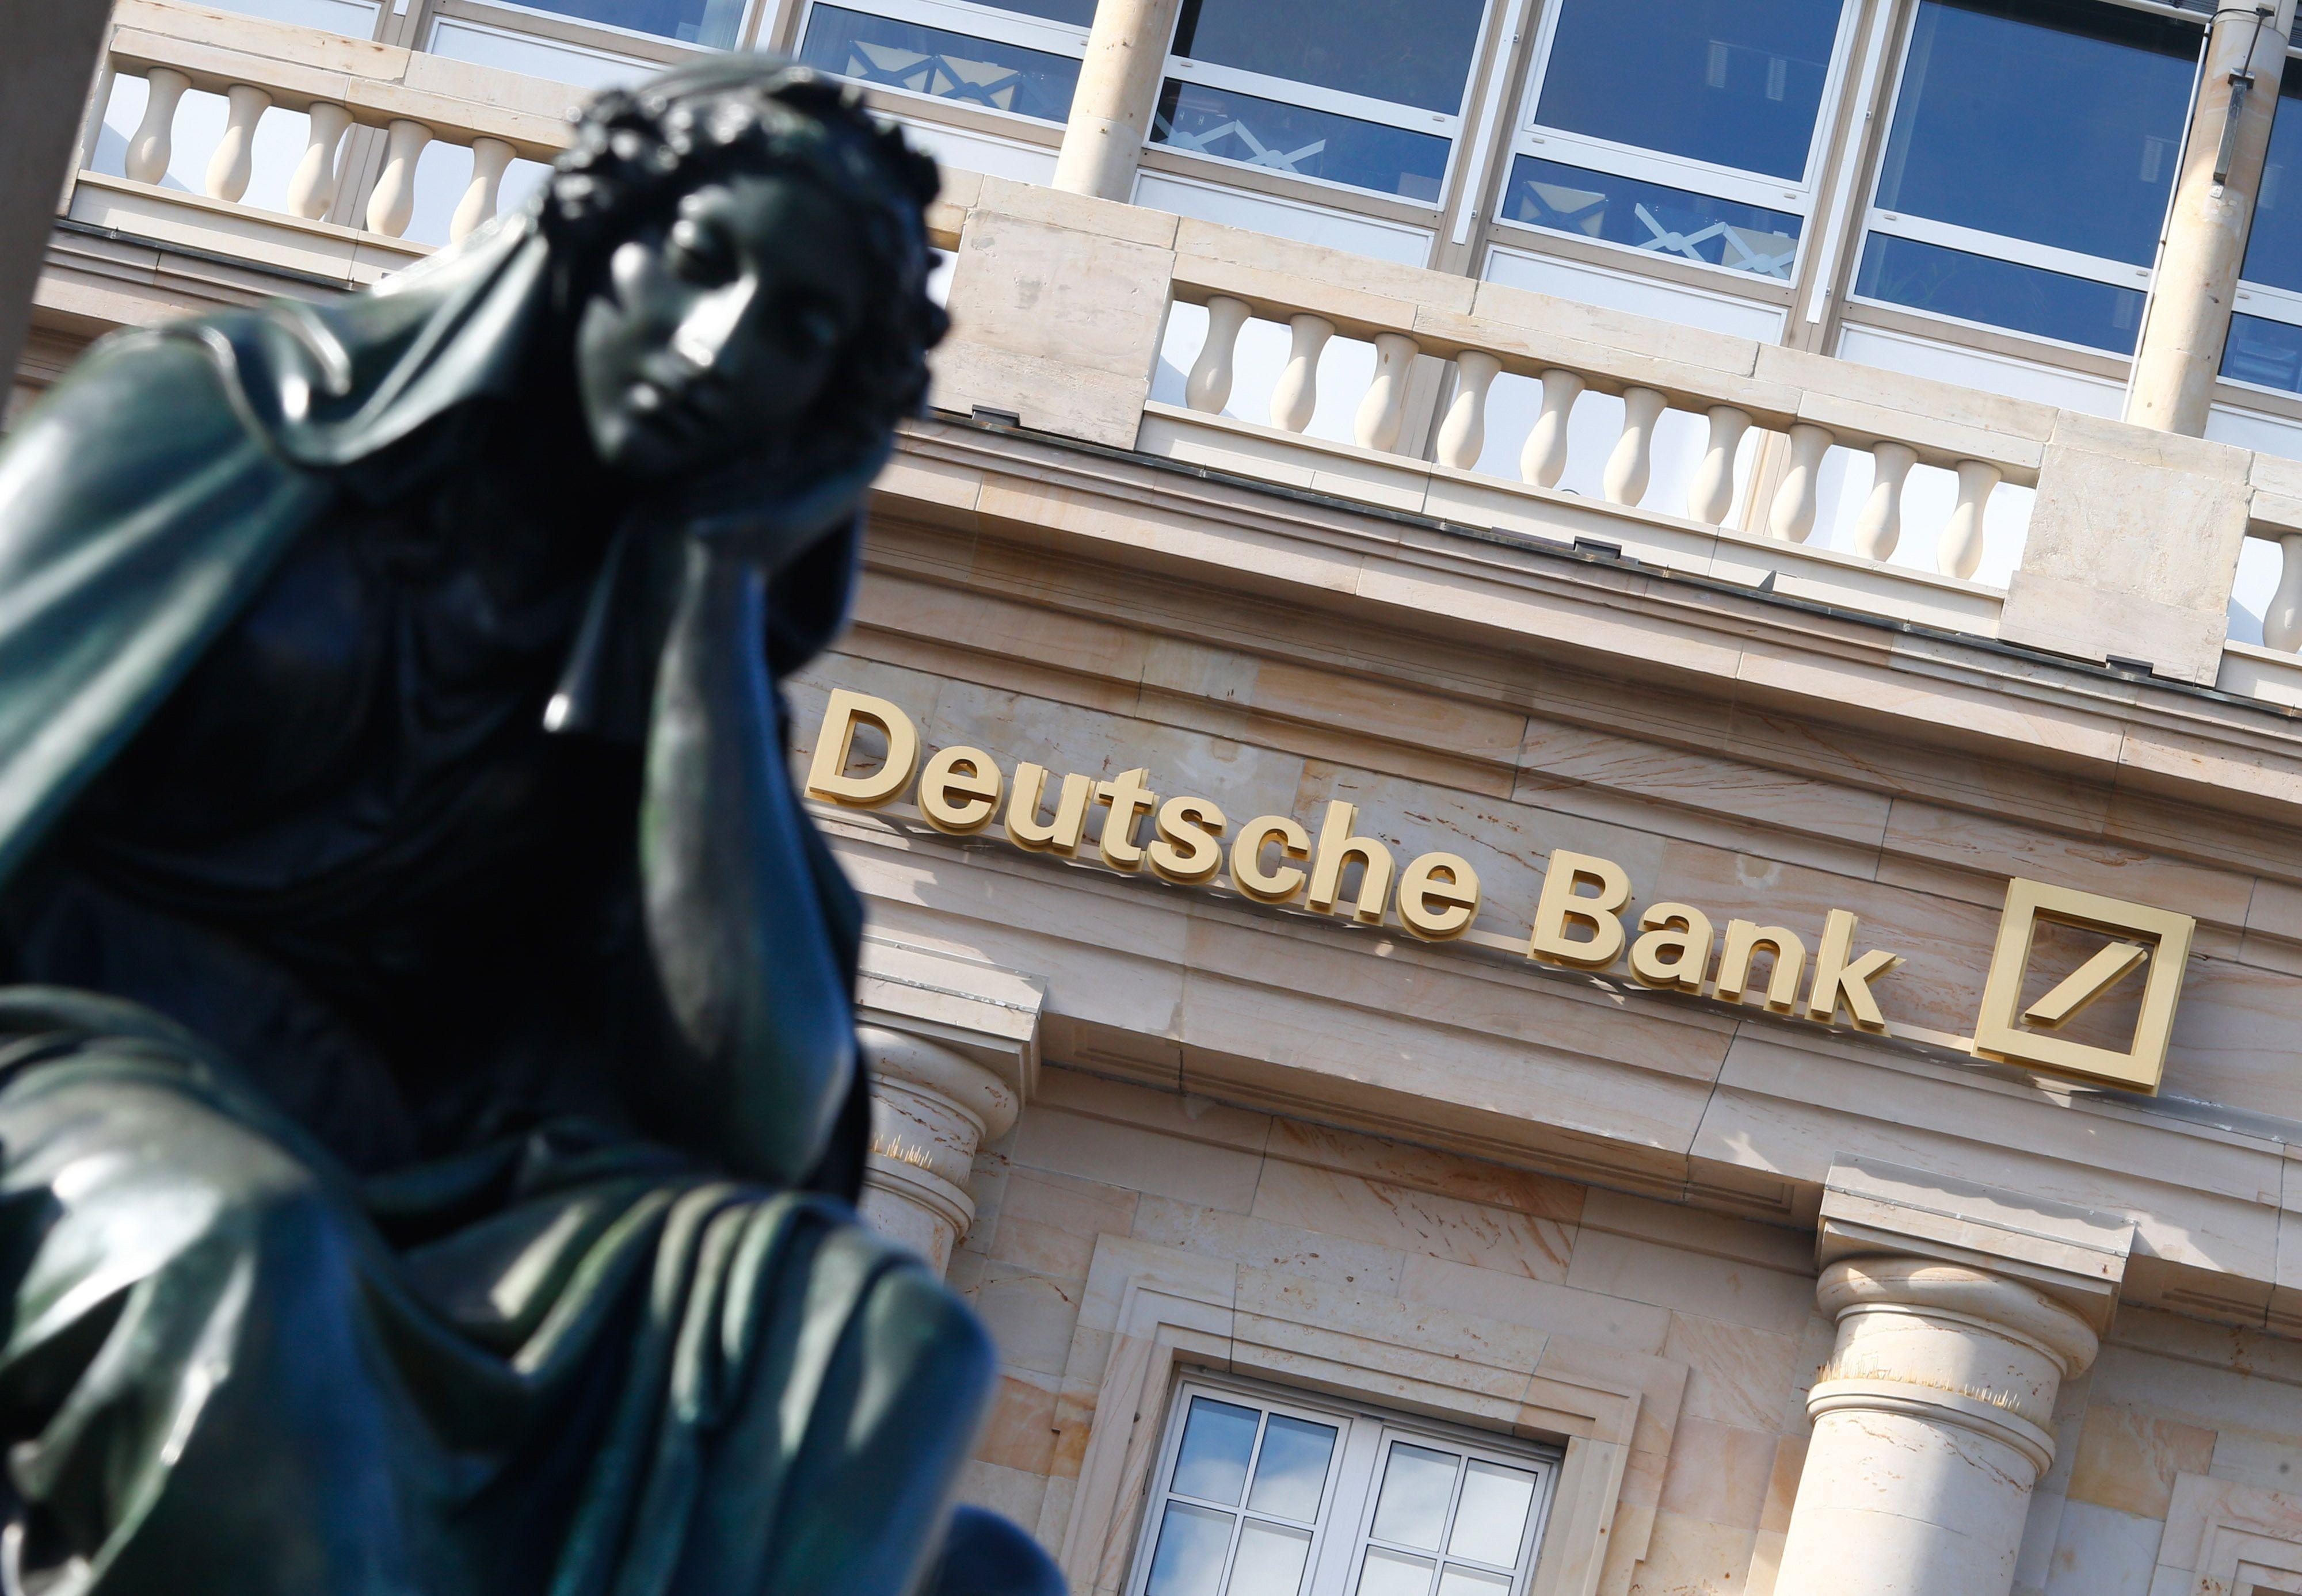 США оштрафовали Deutsche Bank на $200 млн за нарушения санкций против Ирана и Сирии